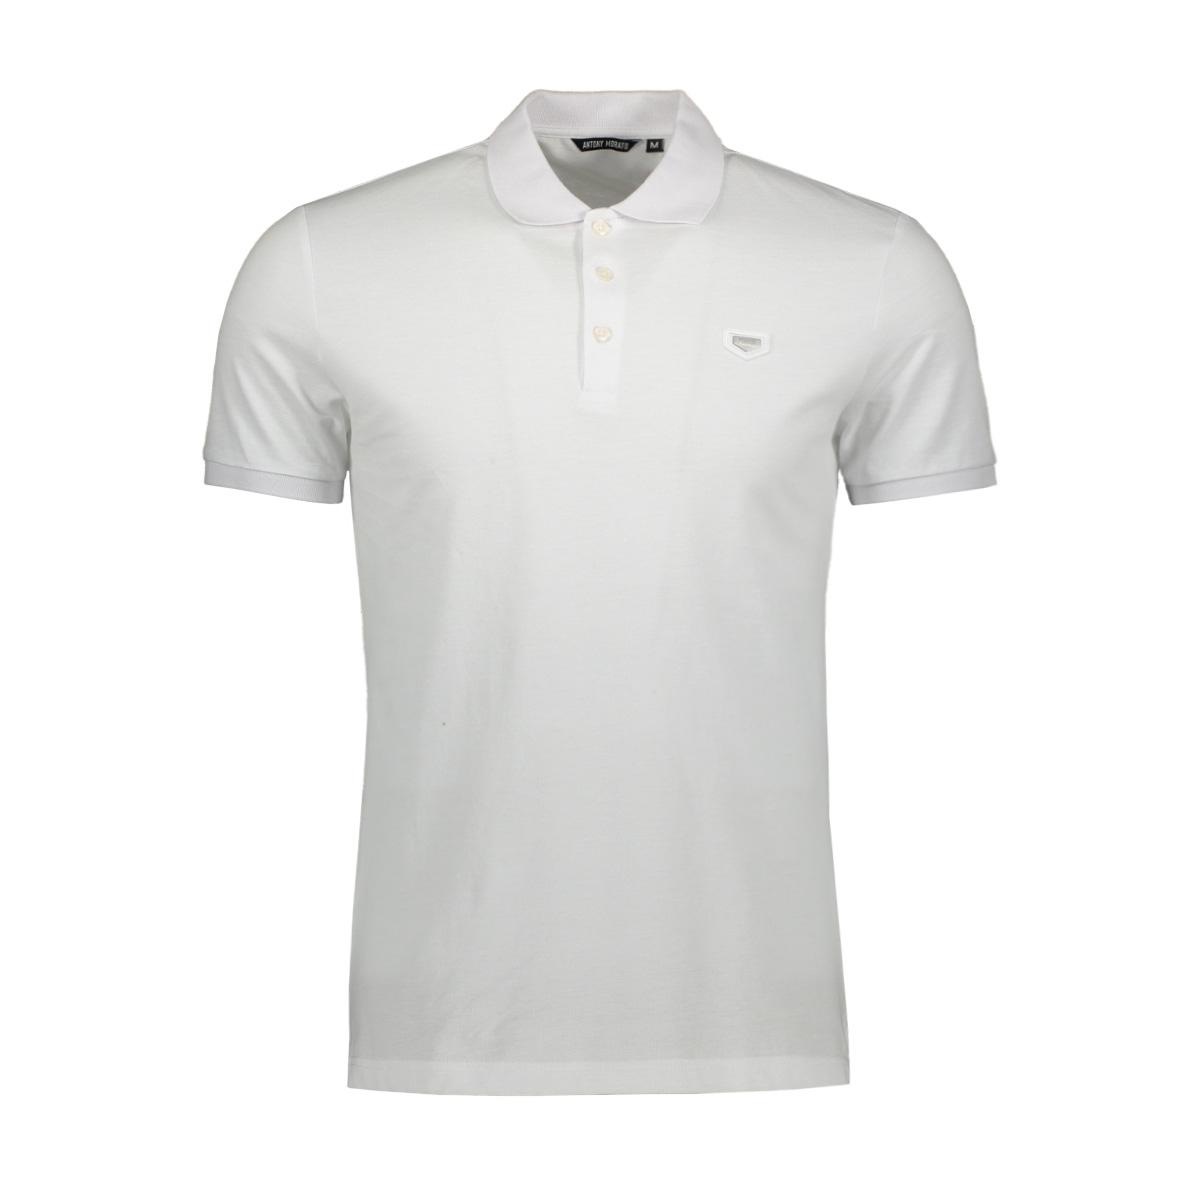 polo with patch mmks01738 antony morato polo 1000 white